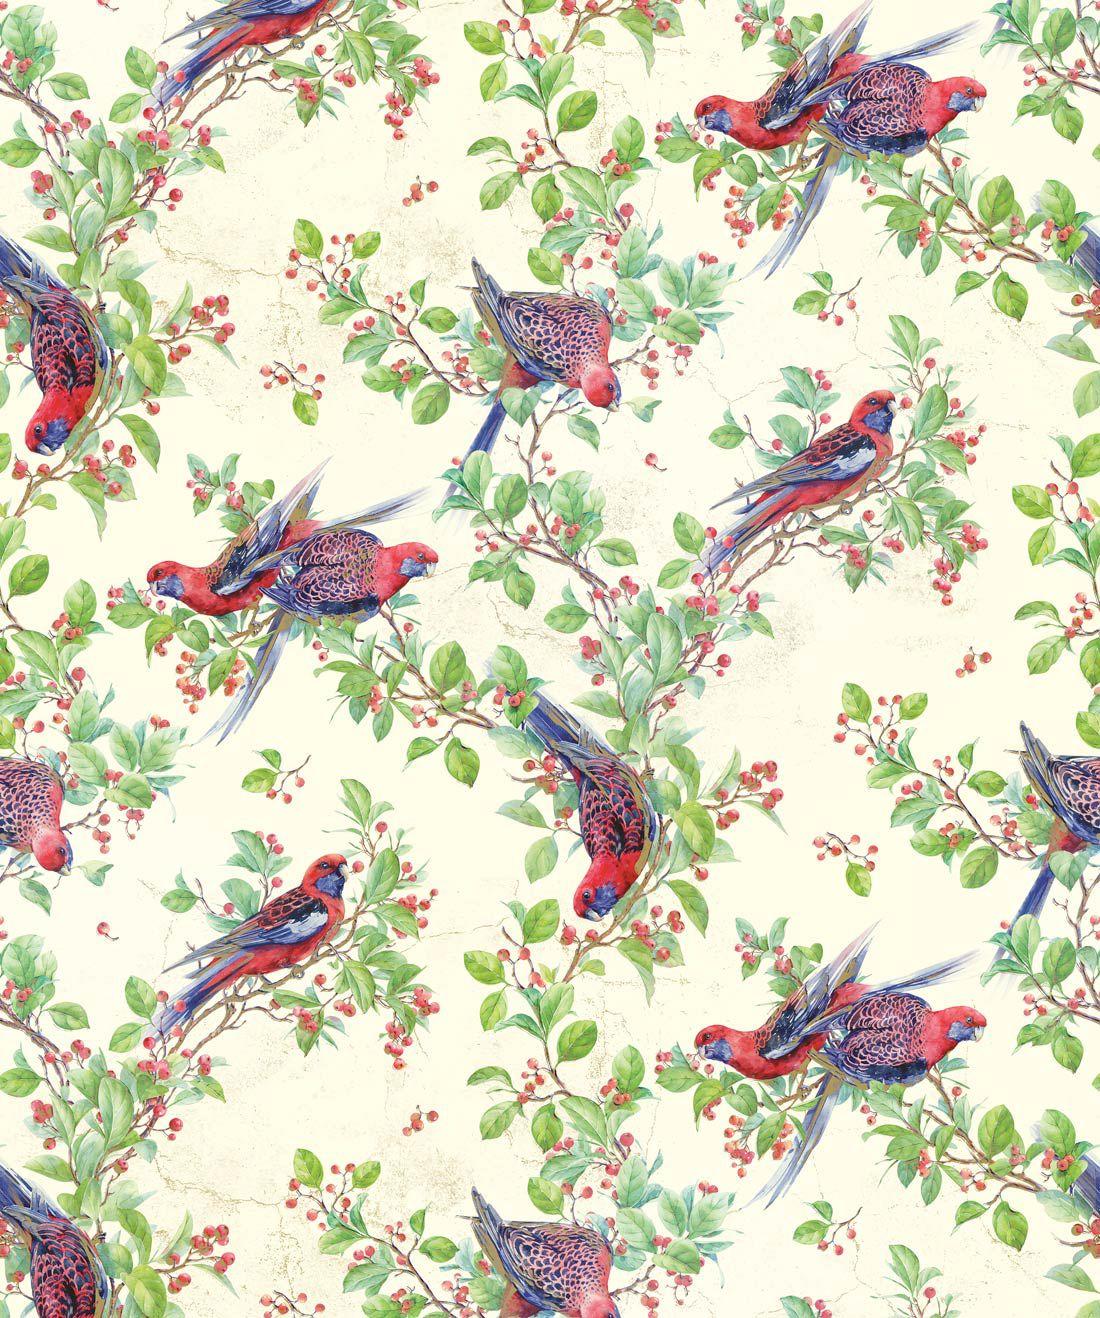 Crimson Rosella Wallpaper